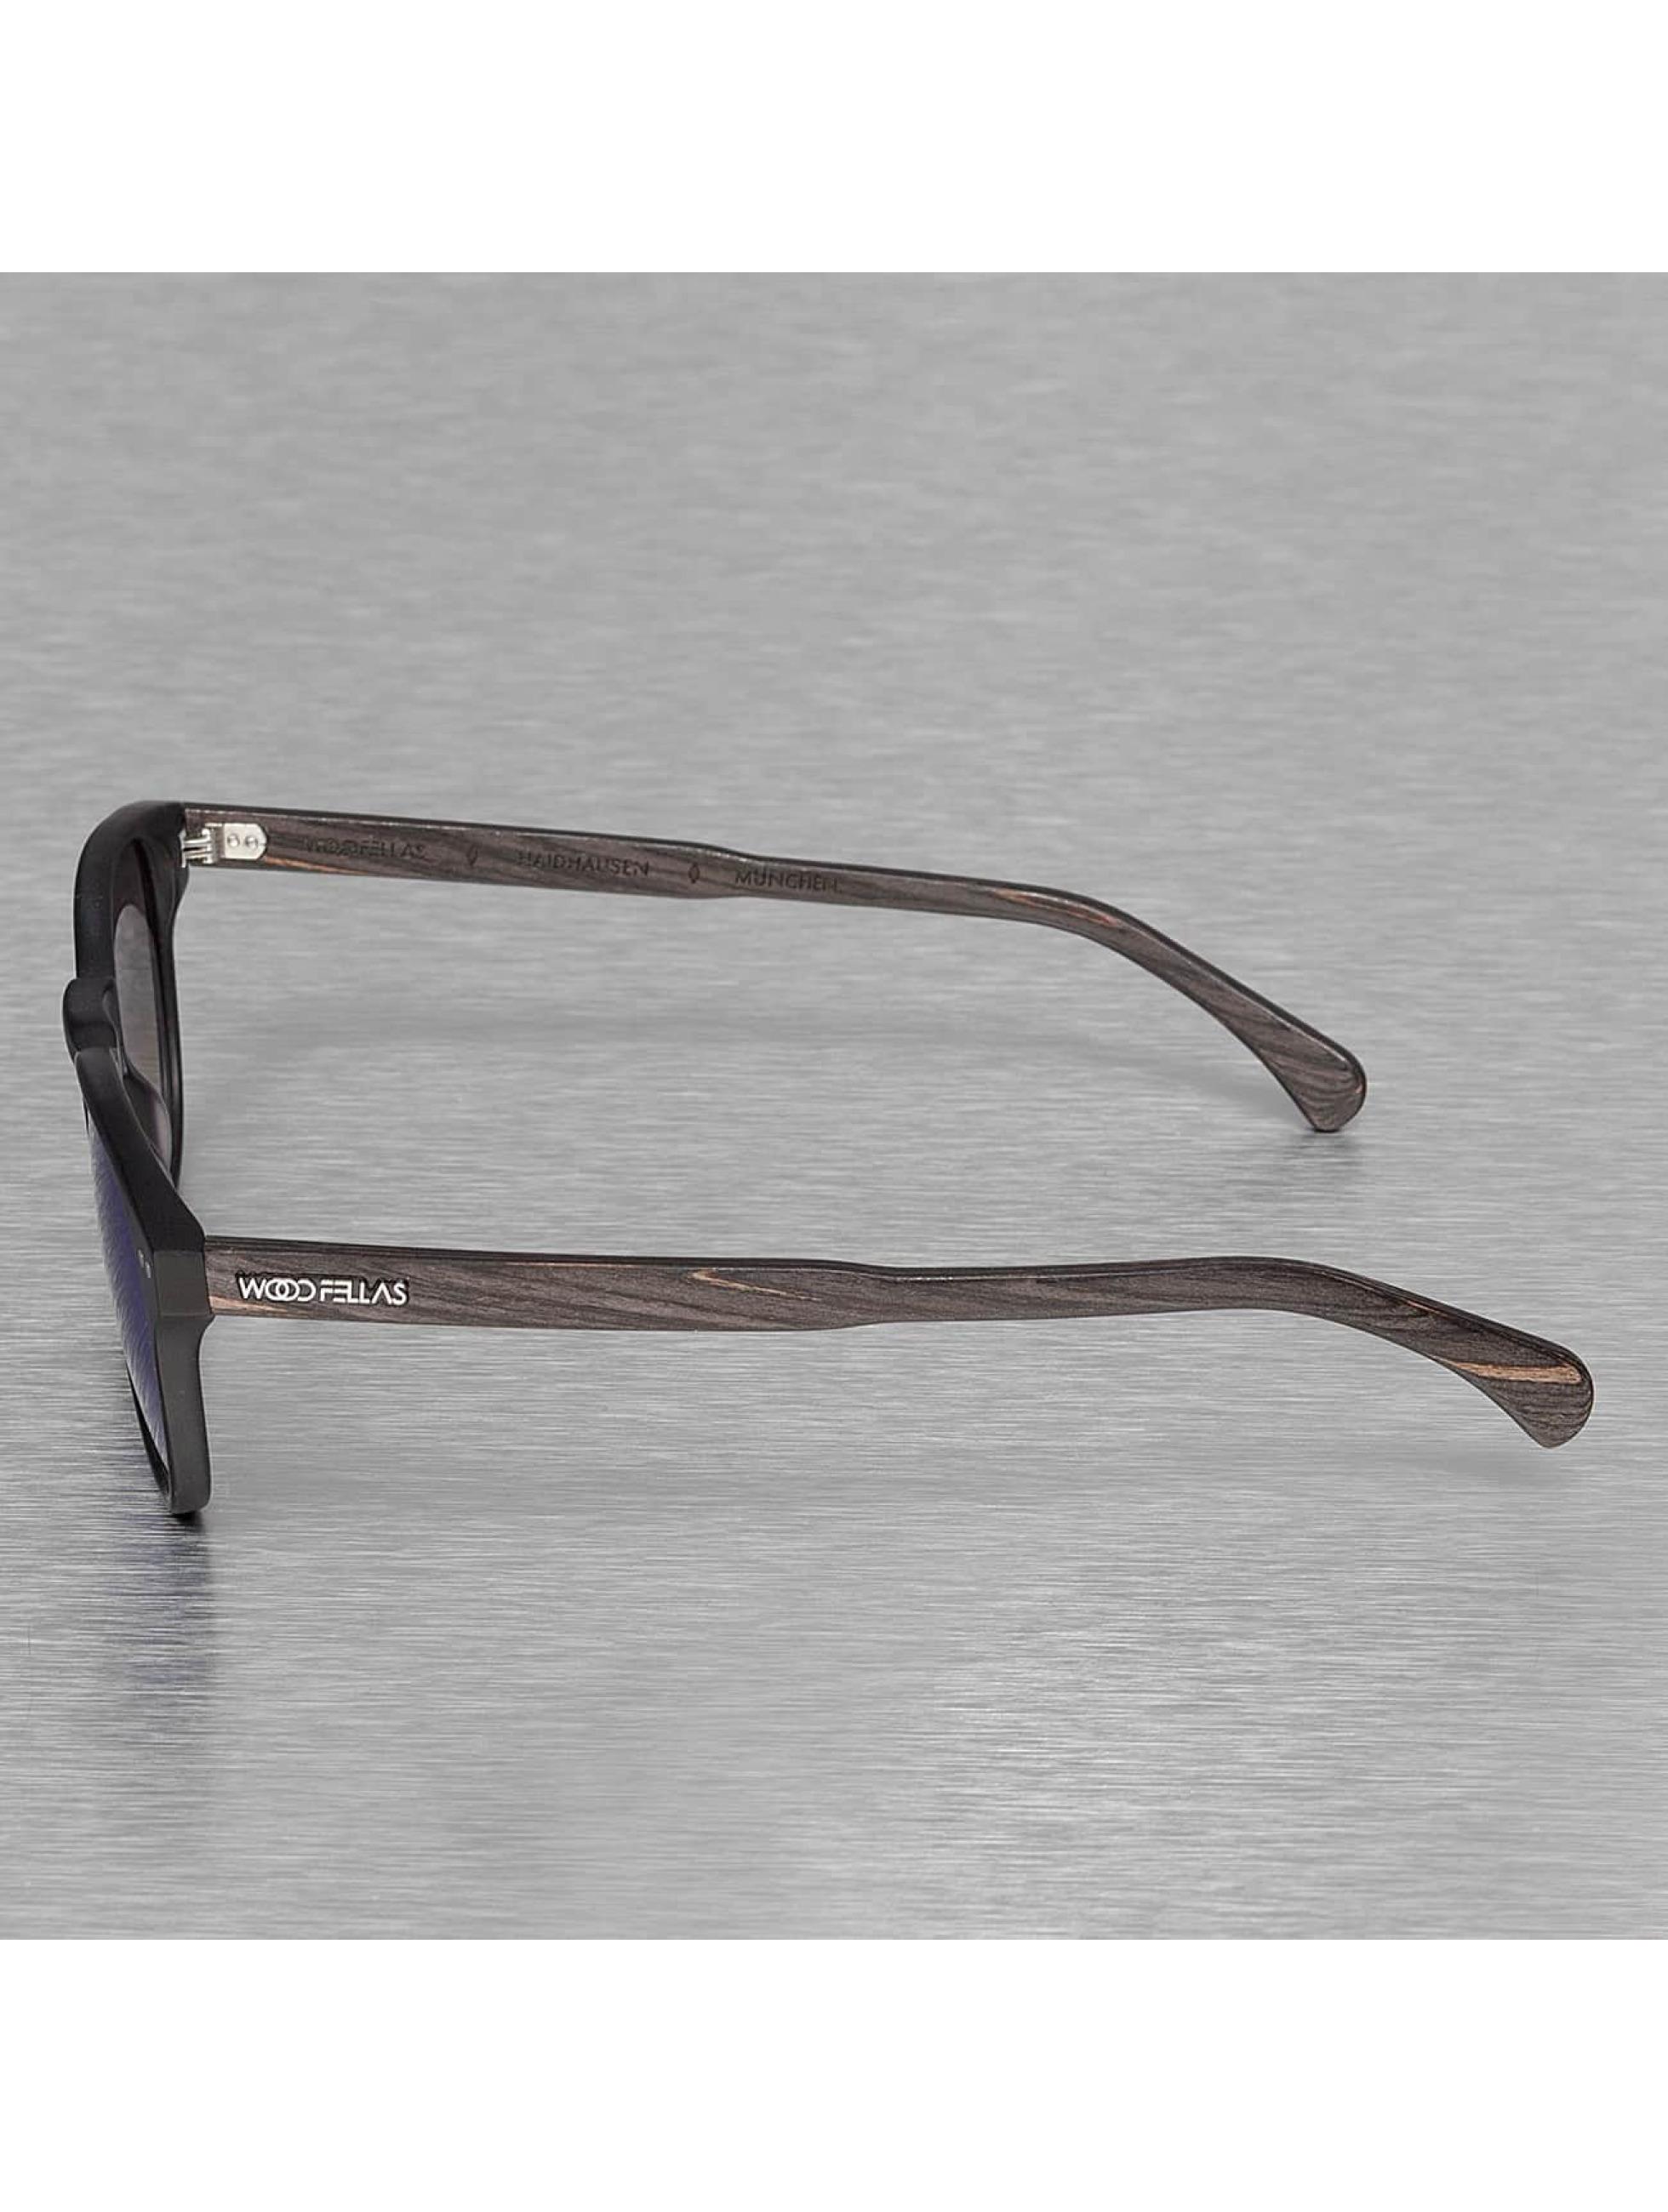 Wood Fellas Eyewear Sunglasses Eyewear Haidhausen Polarized Mirror black